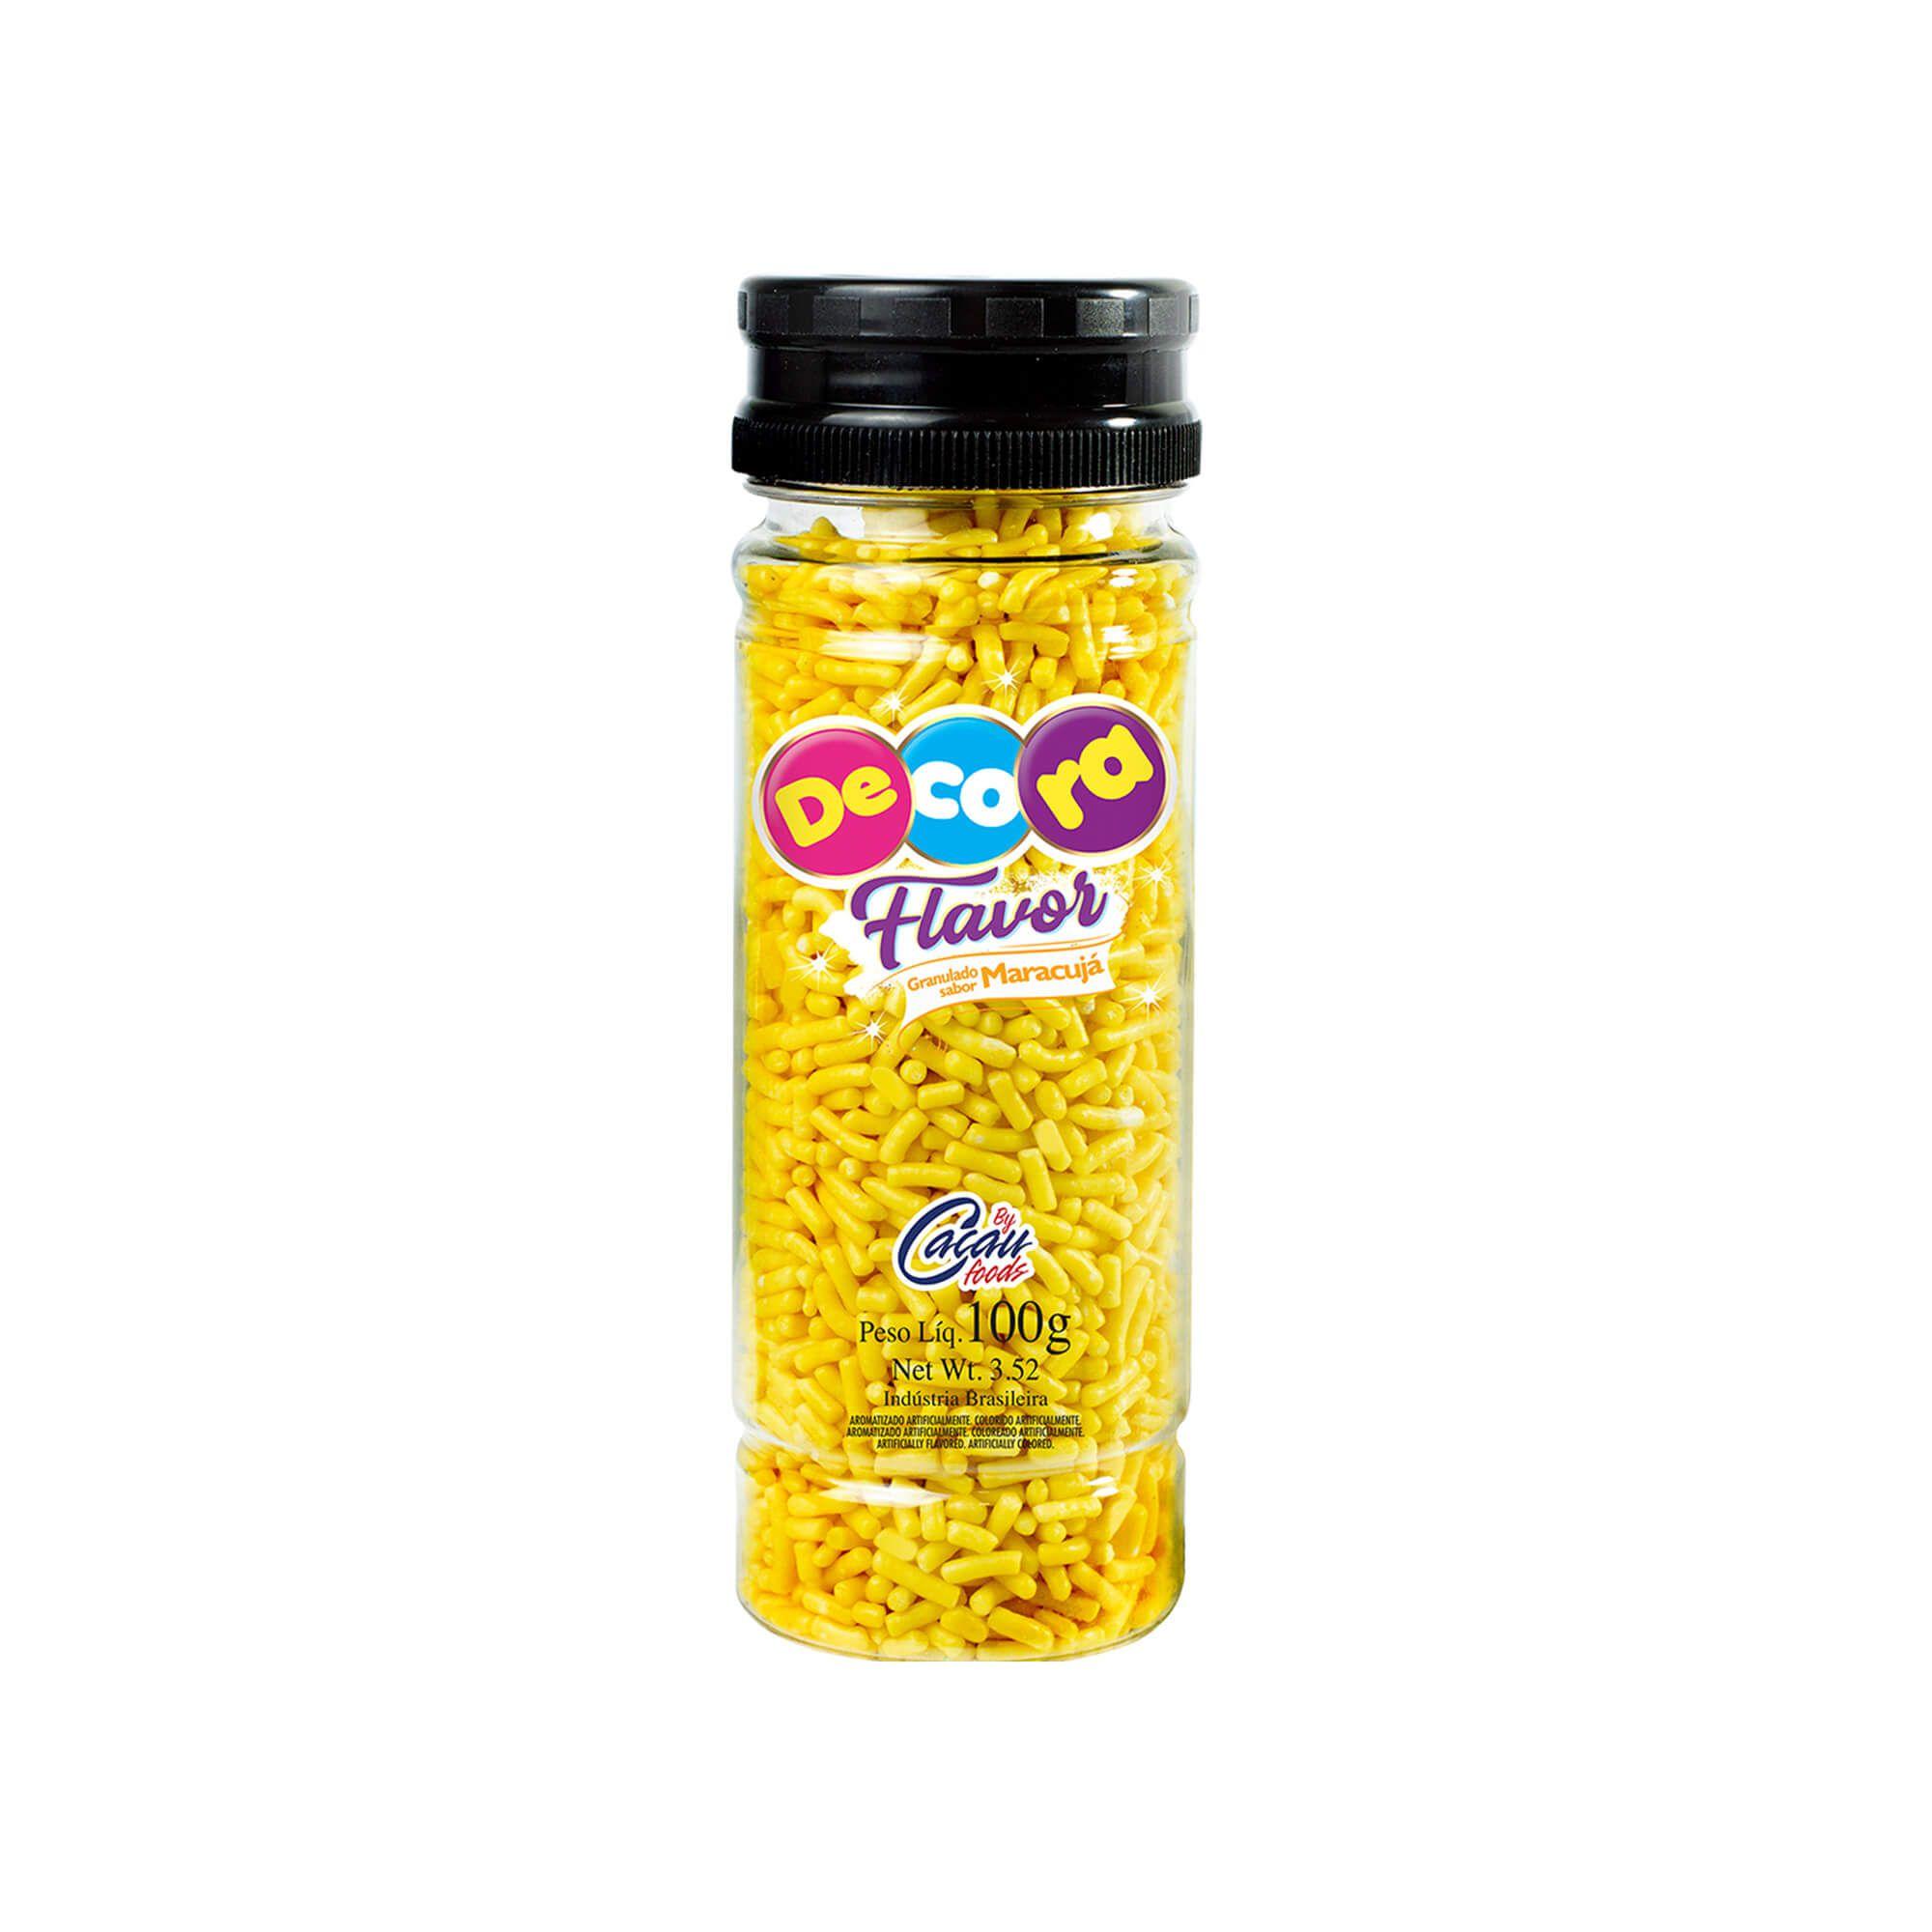 Granulado Decora Flavor Sabor Maracujá 100G